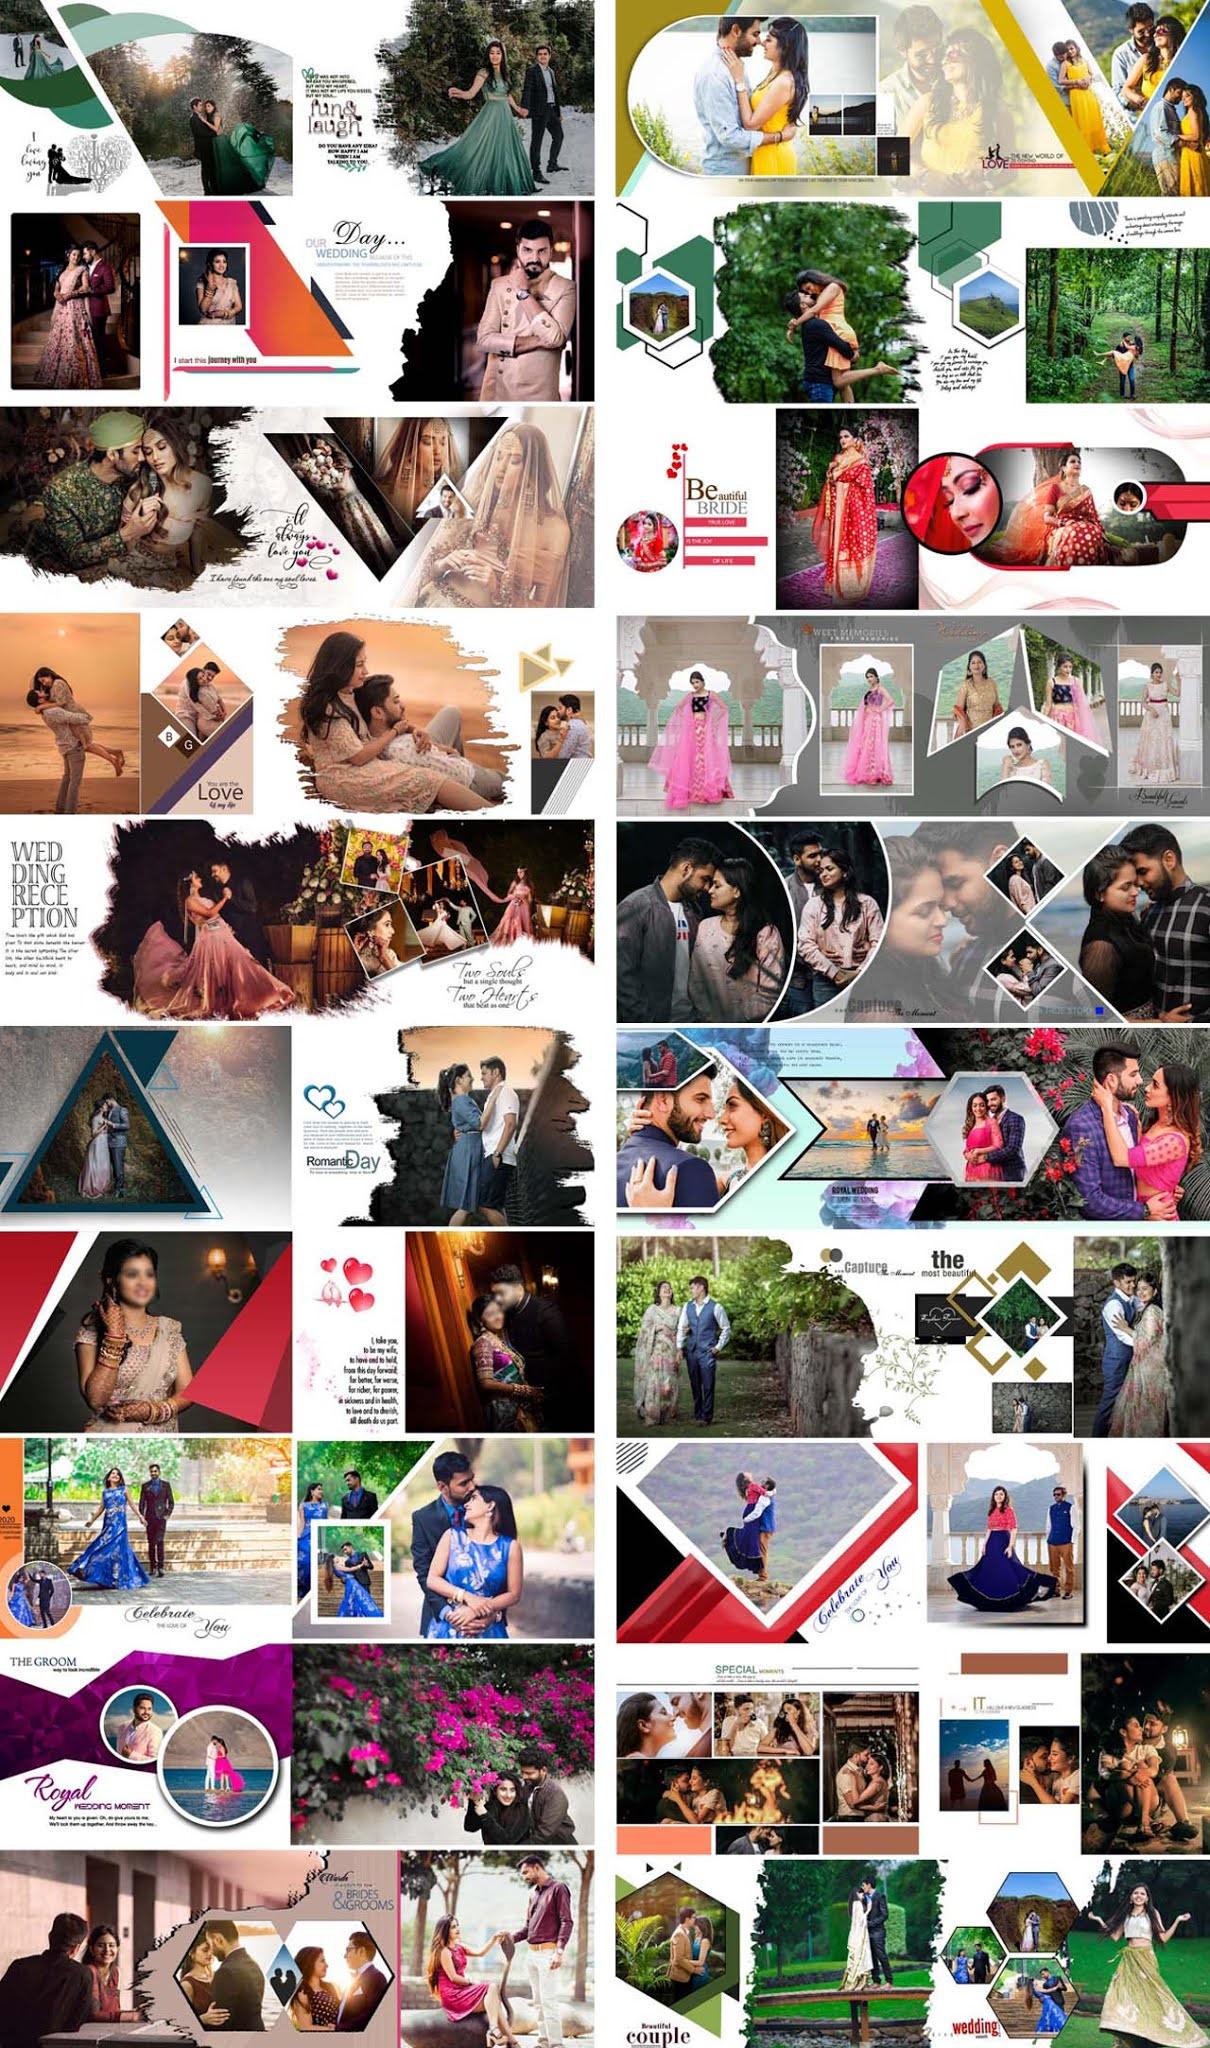 Creative 2021 Pre-Wedding Photo Album Designs